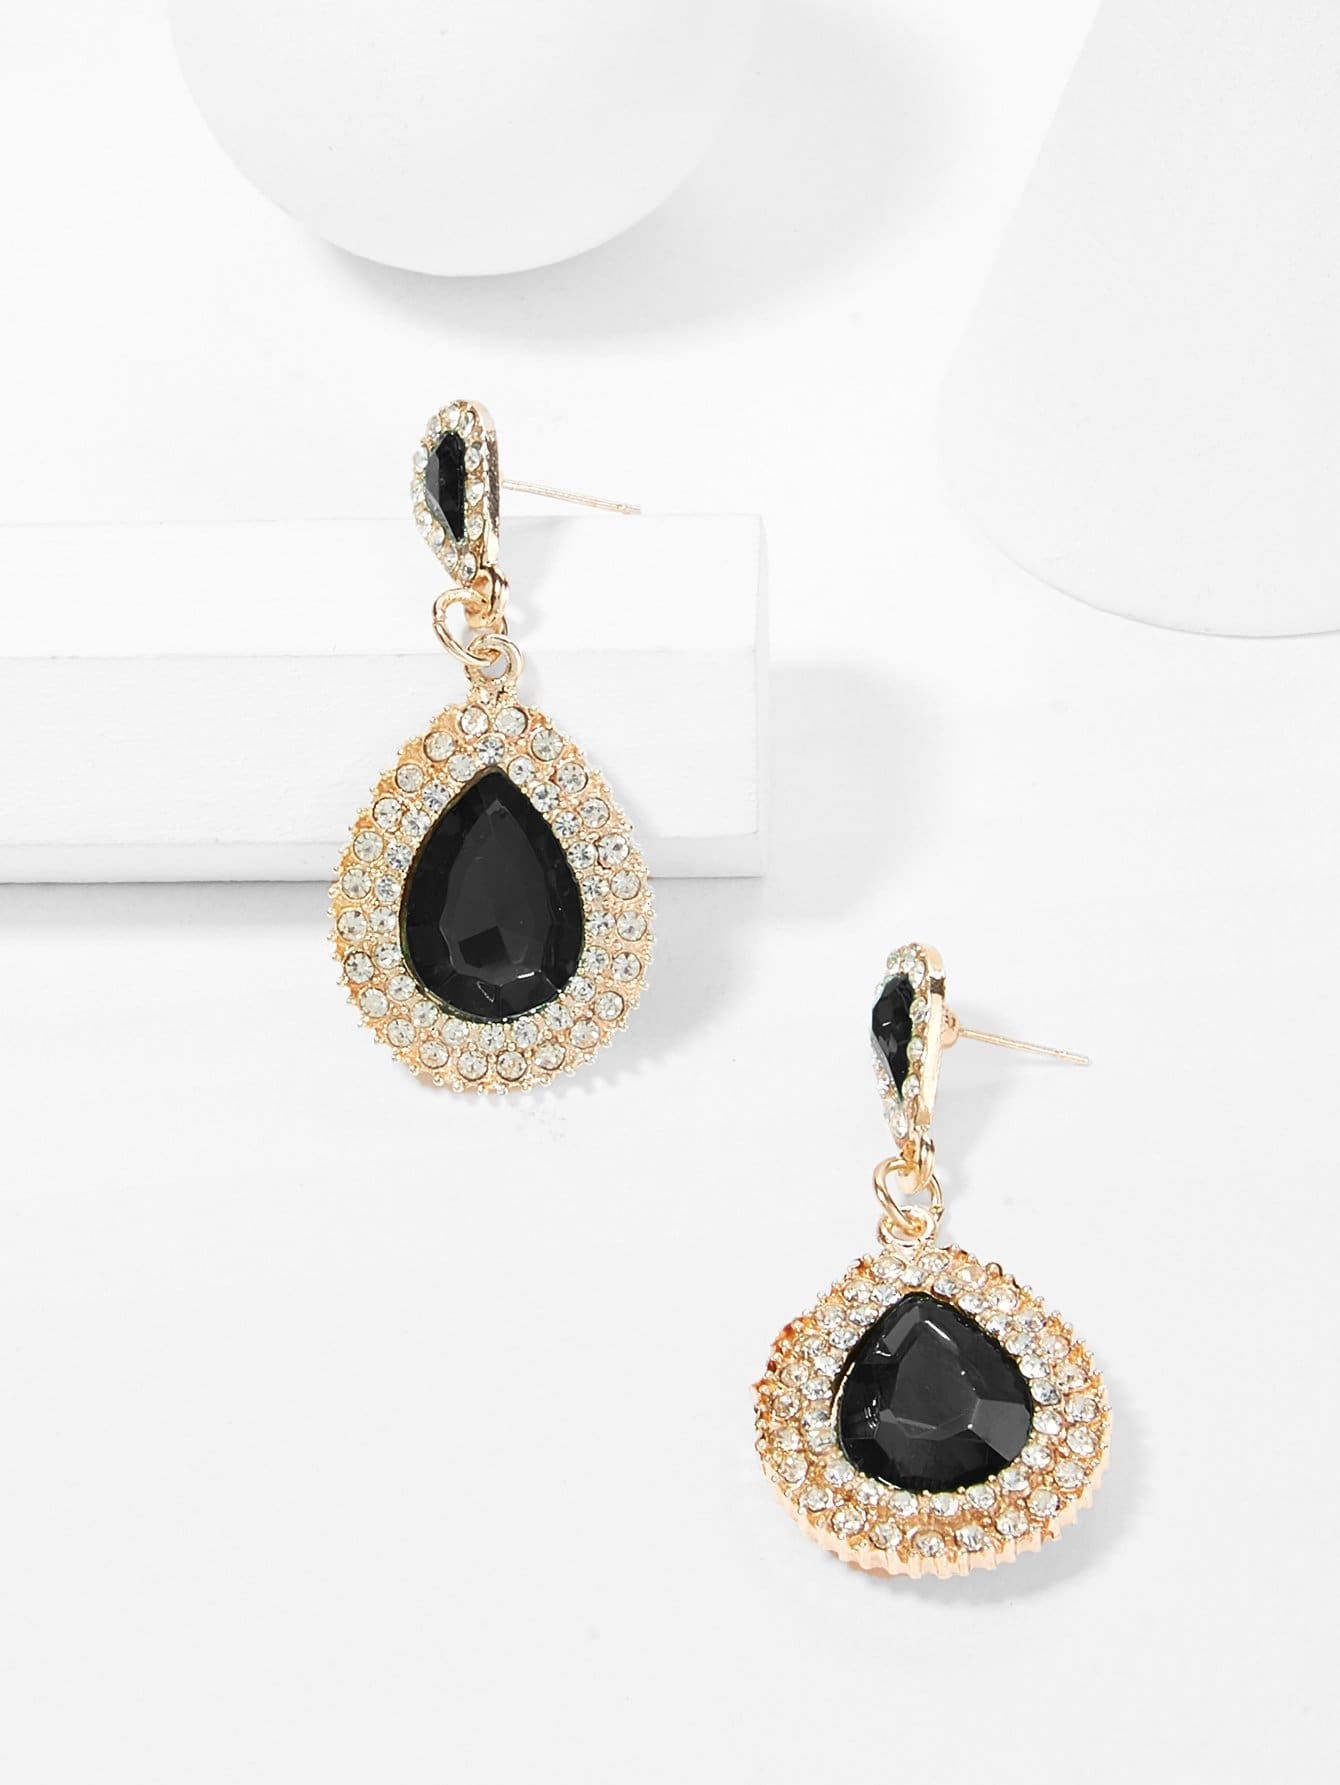 Купить Rhinestone Water Drop Shaped Earrings, null, SheIn